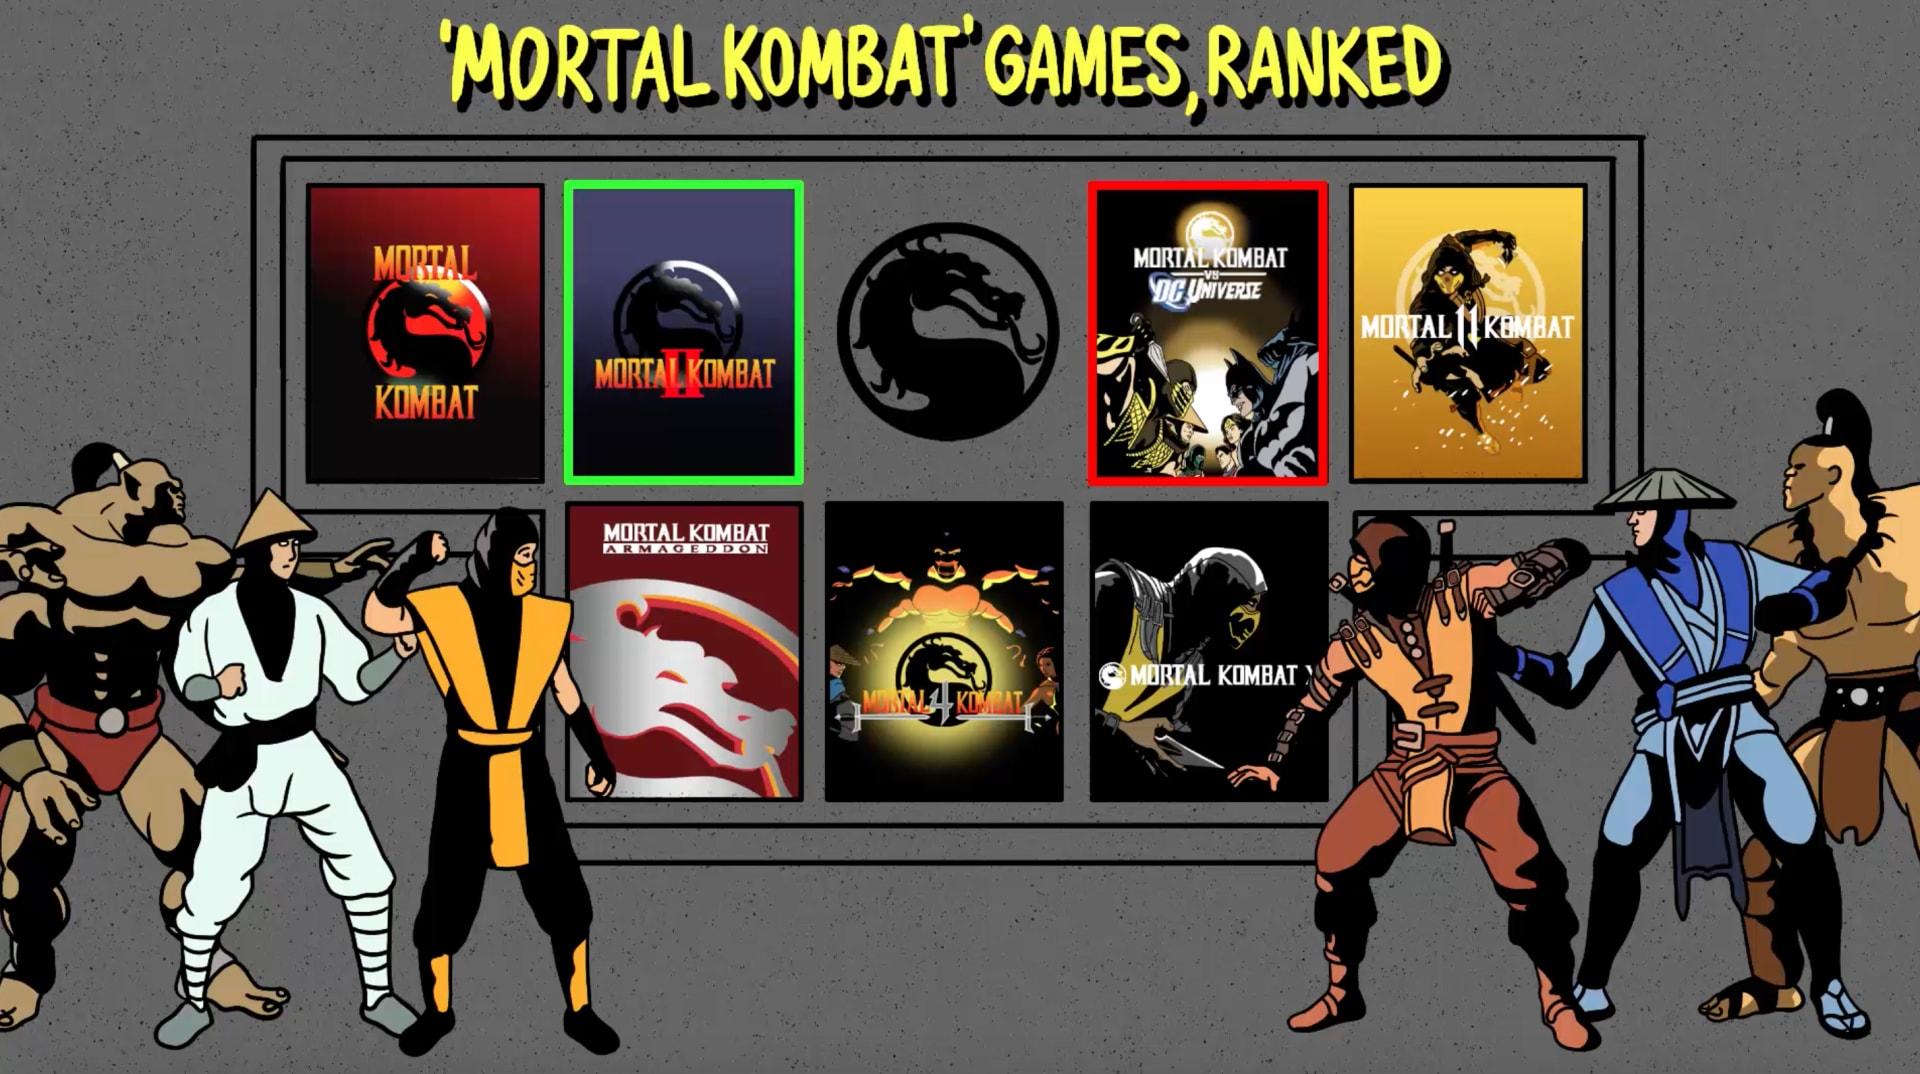 Mortal Kombat Video Games Ranked